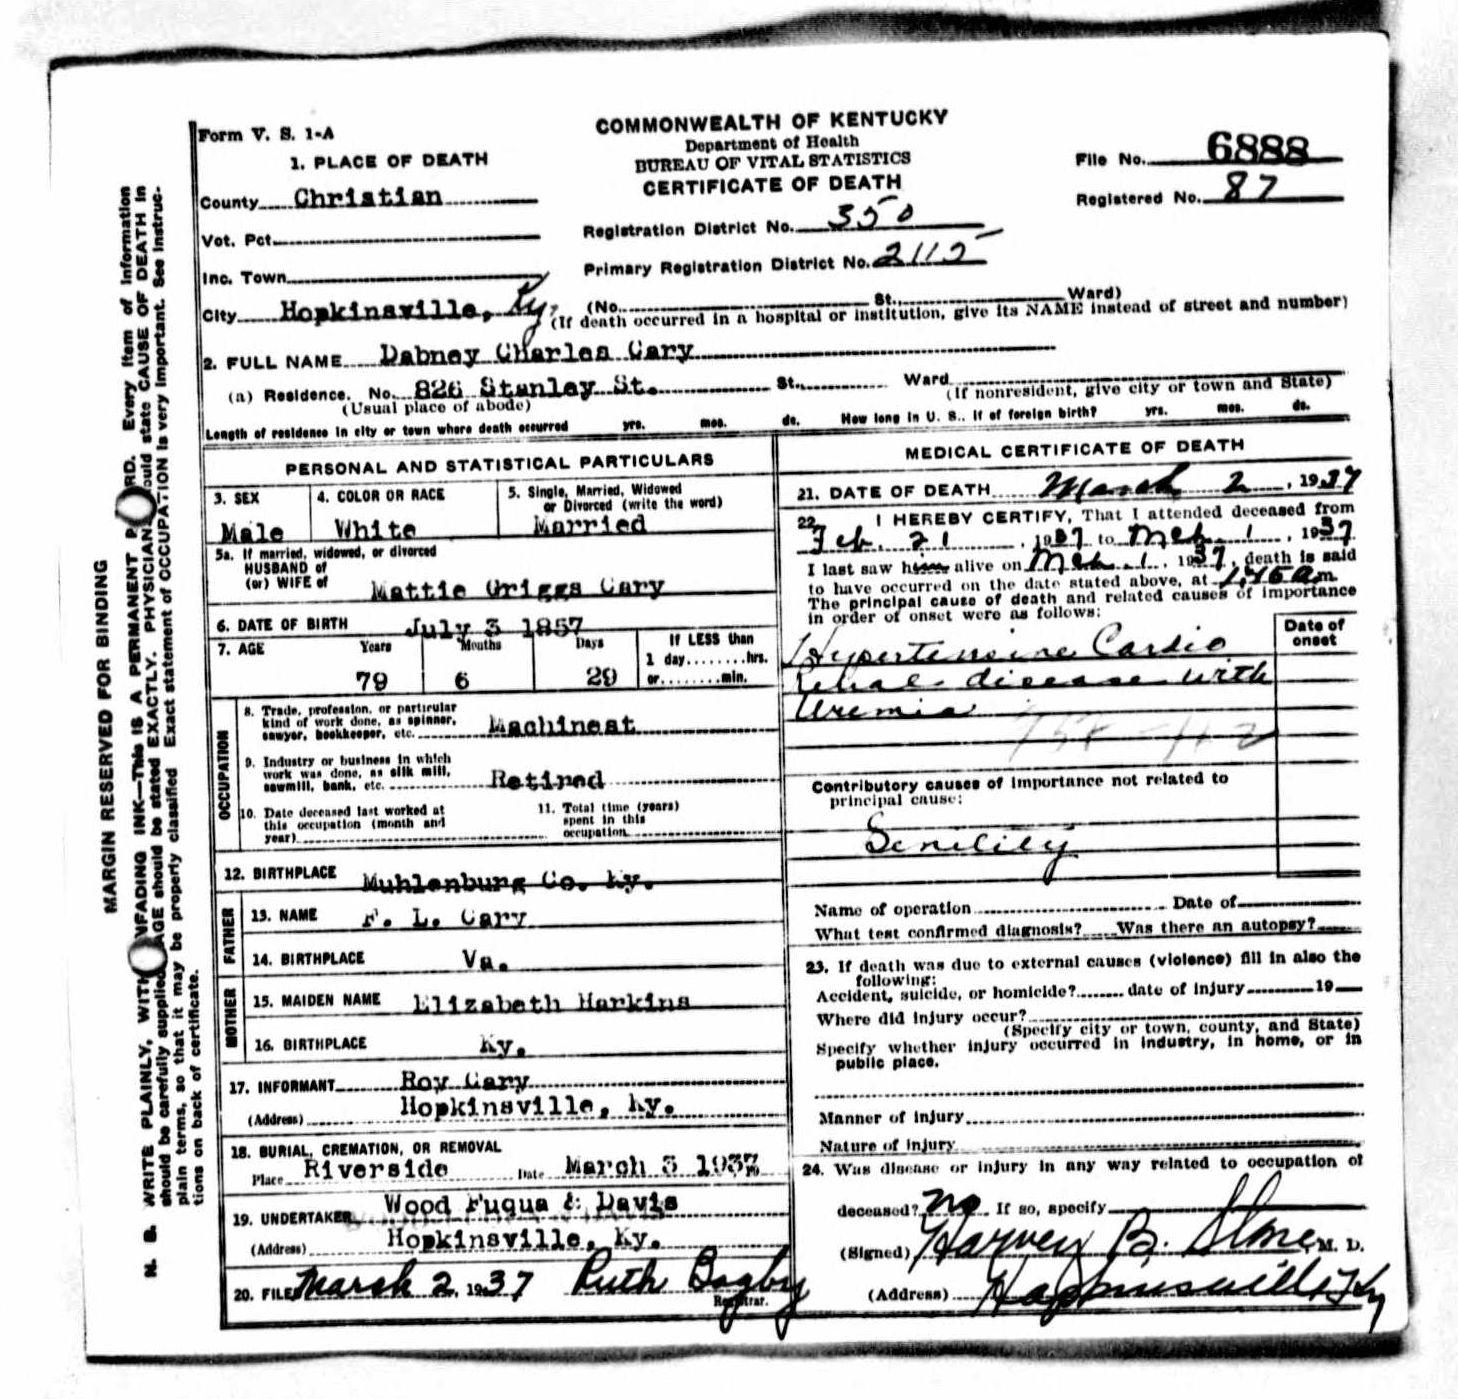 Fresh gallery of birth certificate riverside county business certificates c from birth certificate riverside county image source kykinfolk aiddatafo Images